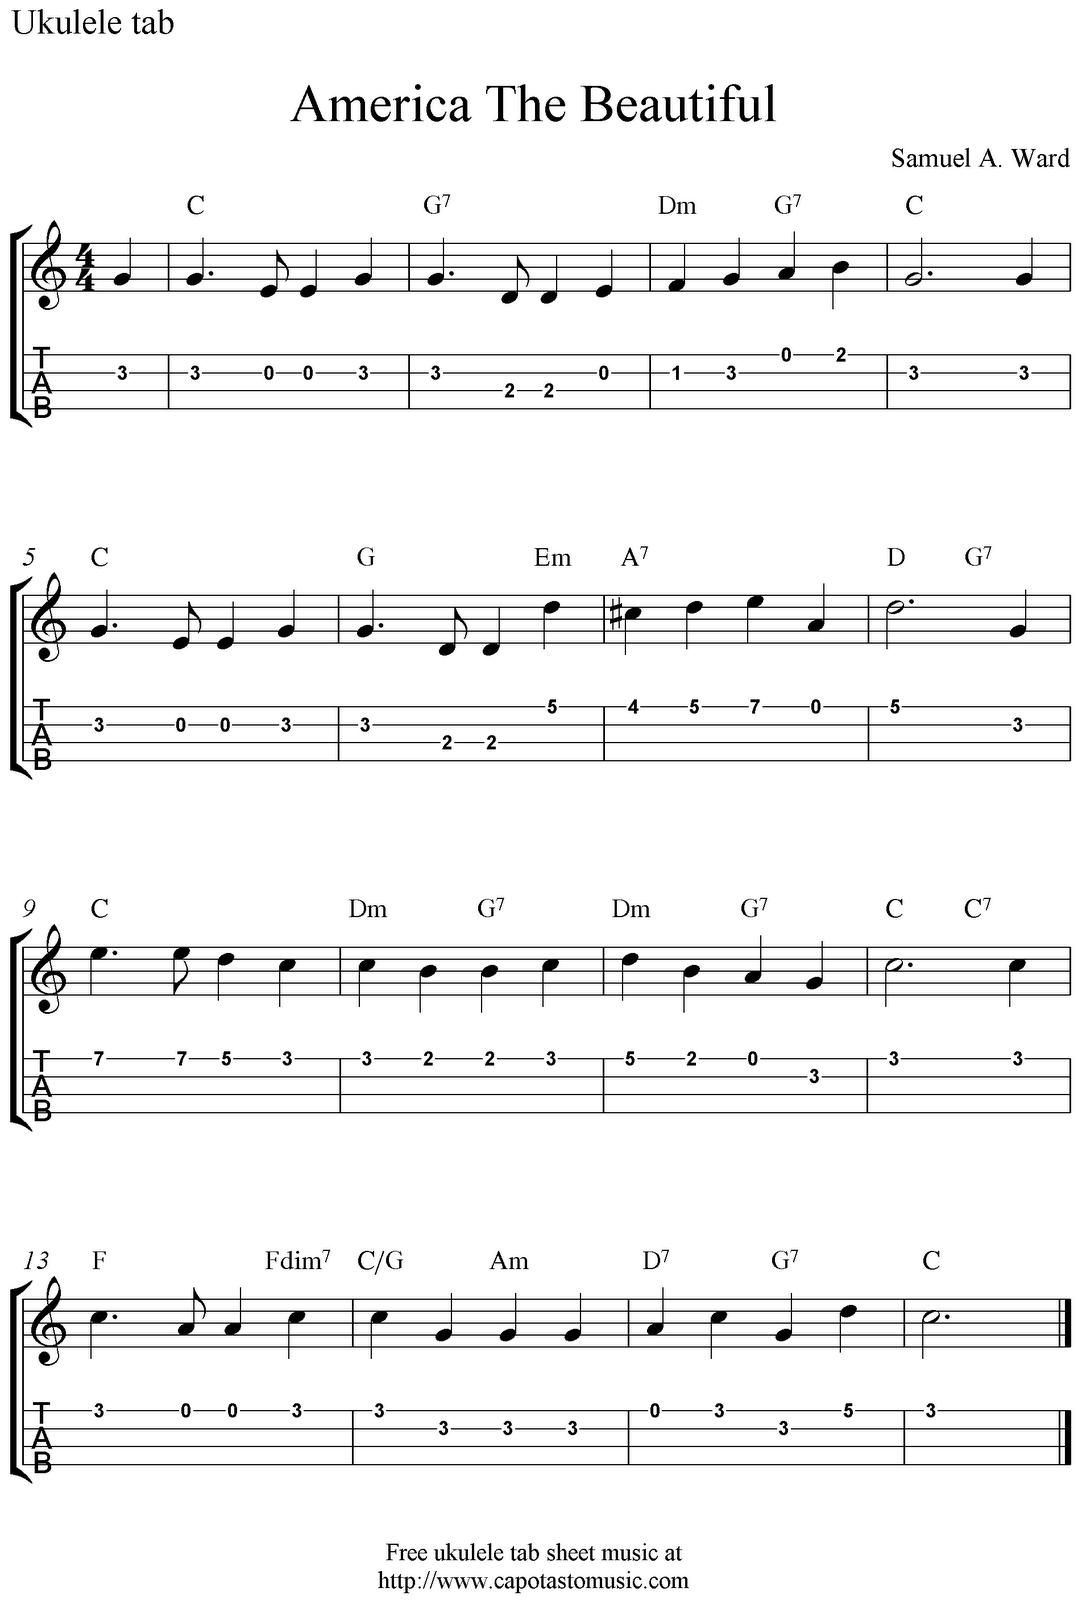 America The Beautiful Ukulele Sheet Music